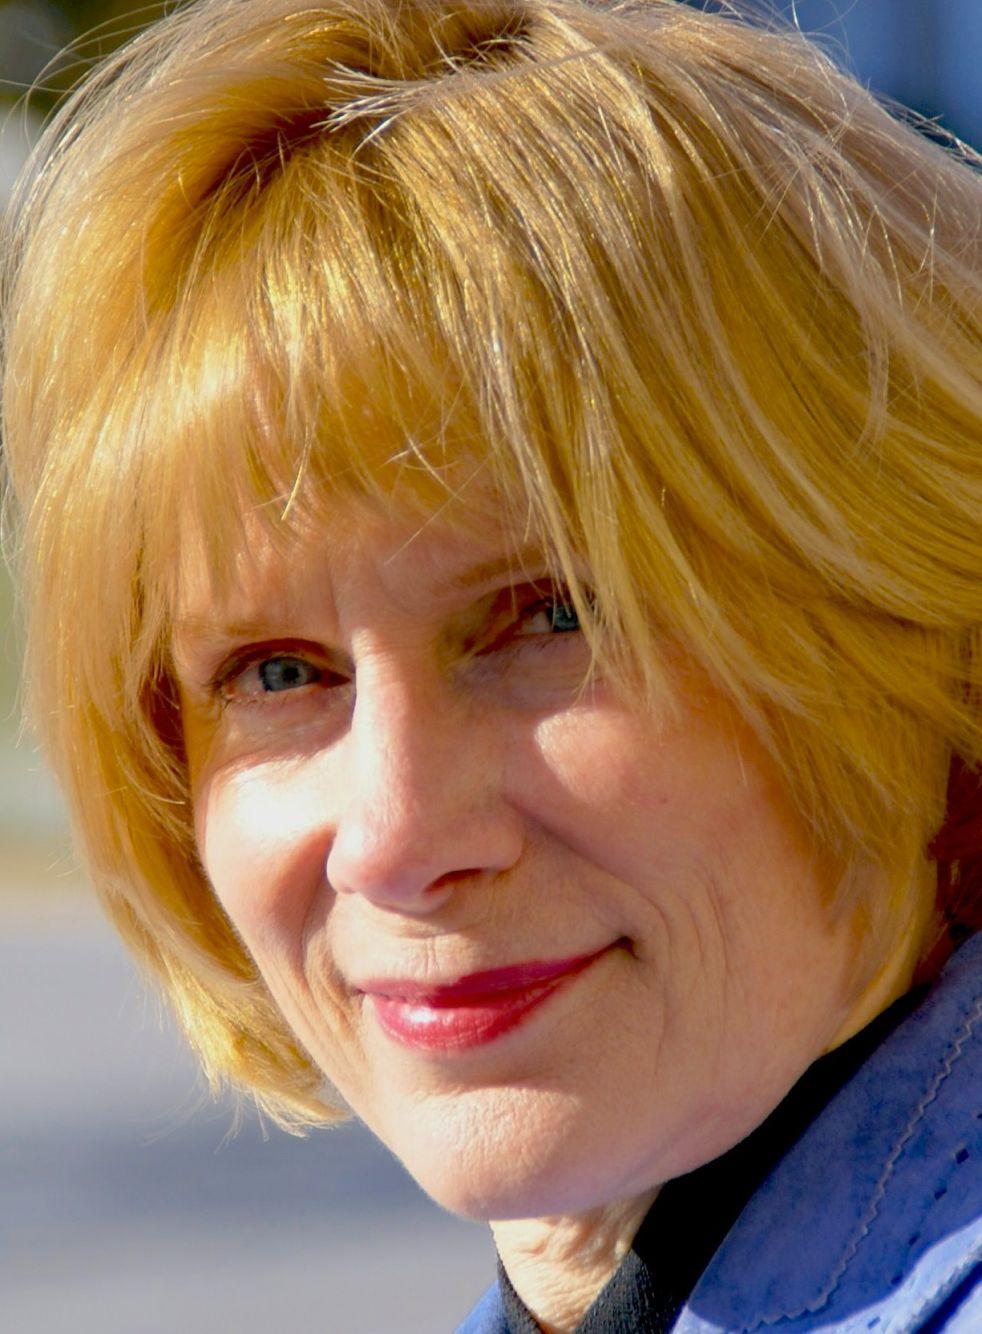 Author Katherine Ramsland